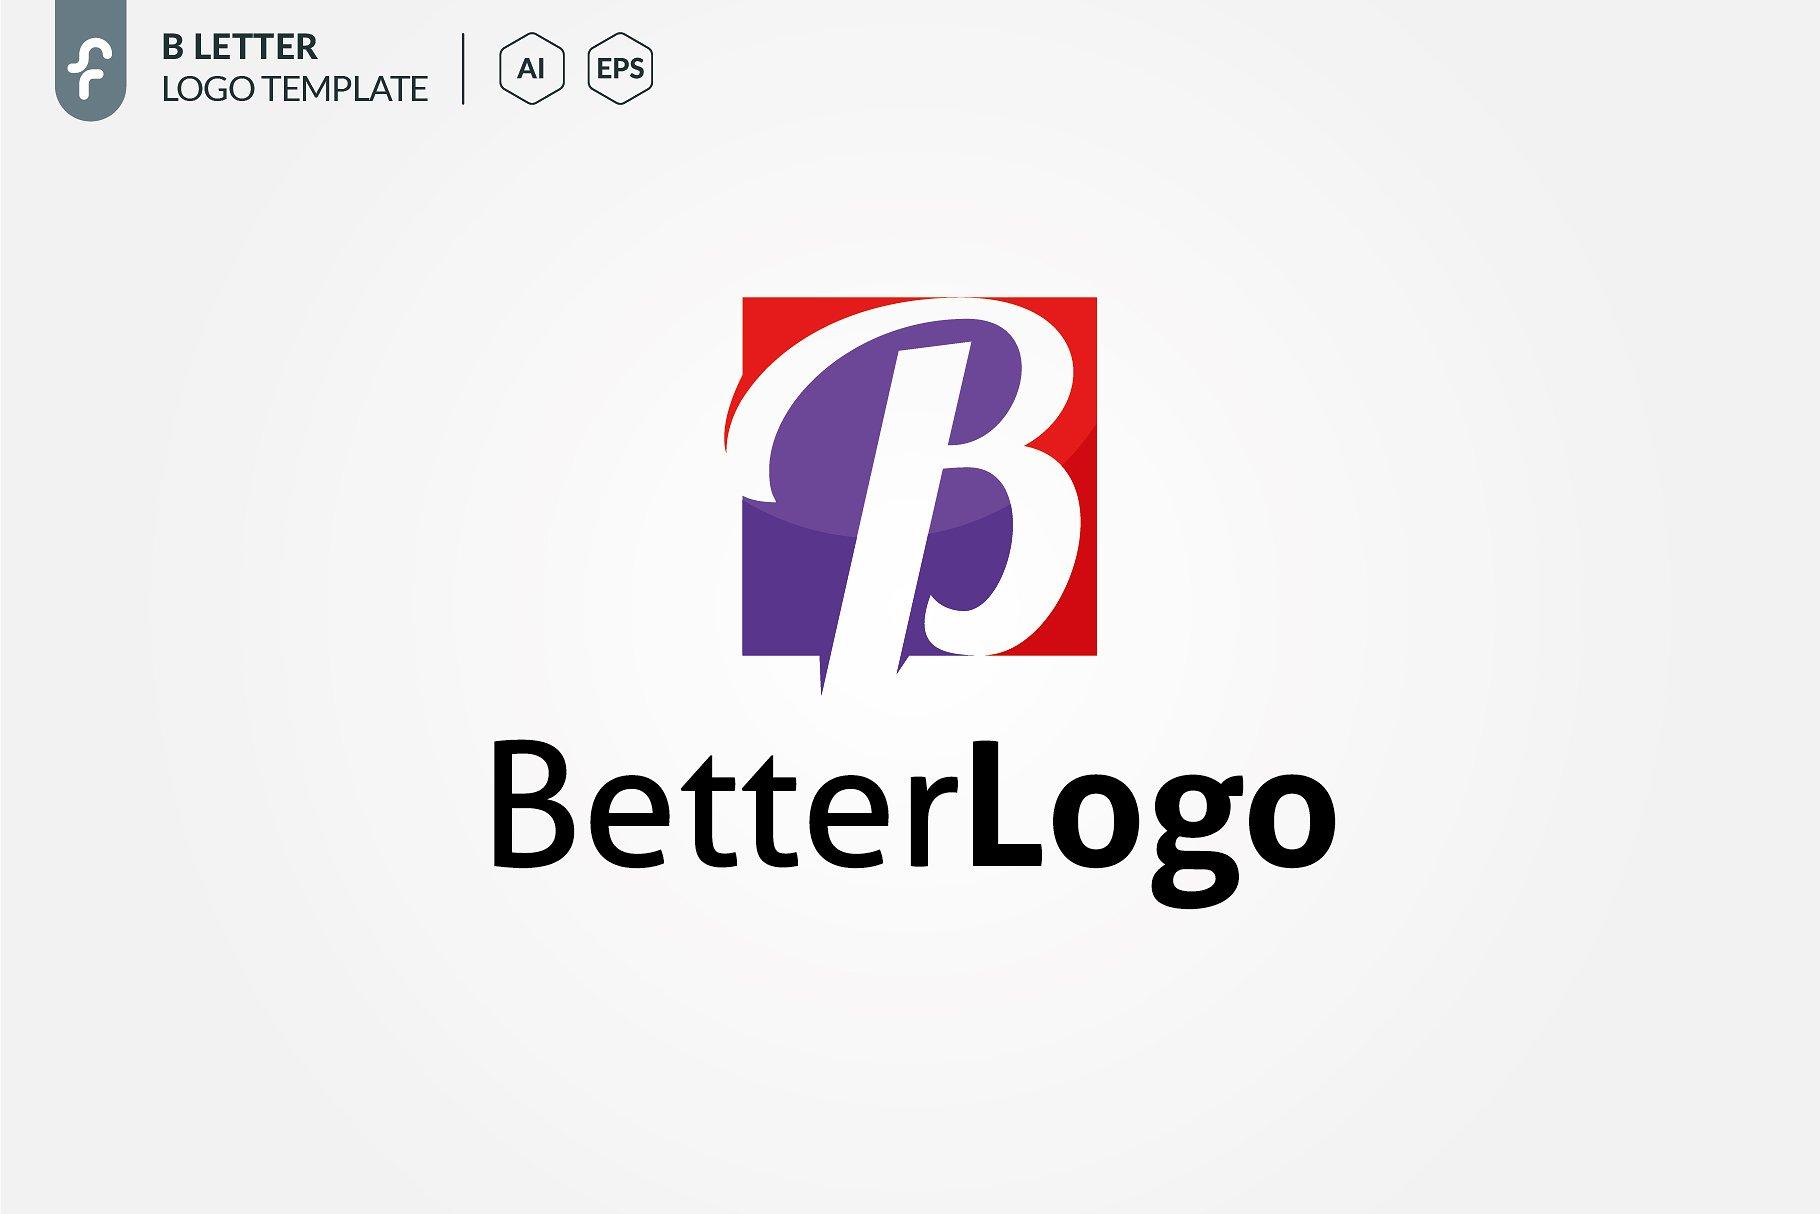 B letter logo logo templates creative market pro accmission Images